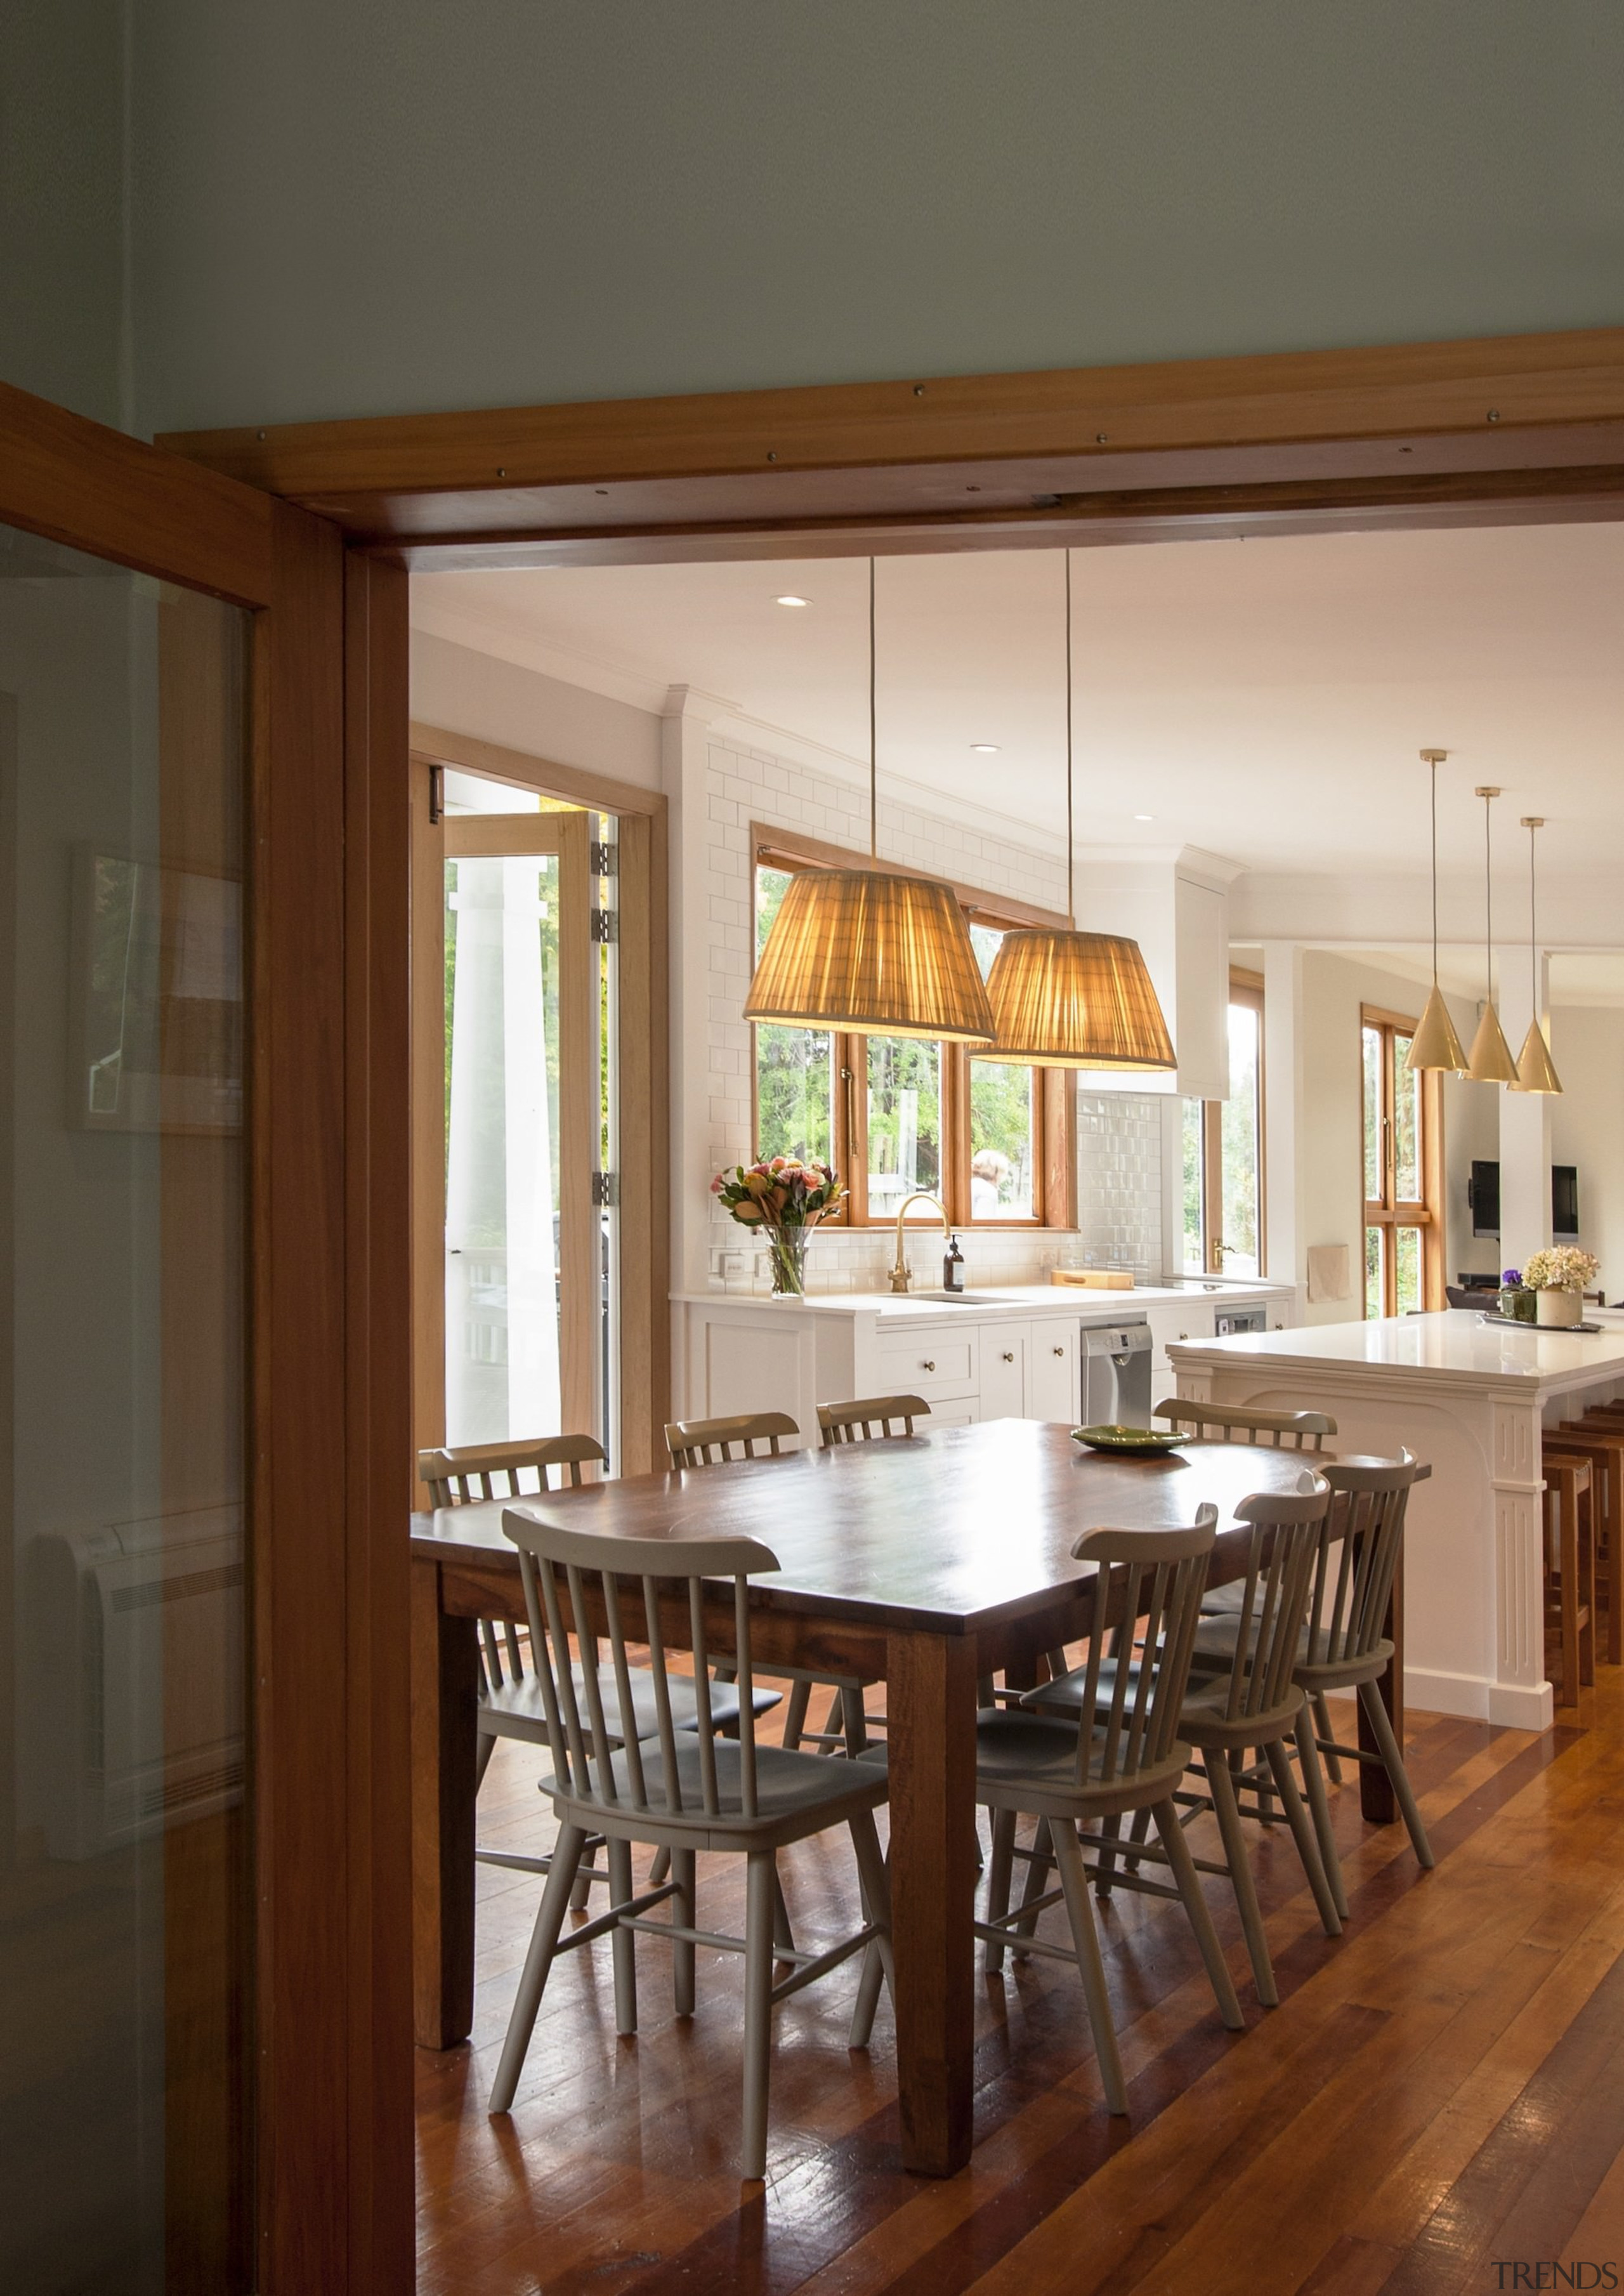 TIDA NZ 2017 – Designer kitchen entrant – cabinetry, chair, countertop, dining room, floor, flooring, furniture, hardwood, interior design, kitchen, room, table, window, wood, wood flooring, brown, gray